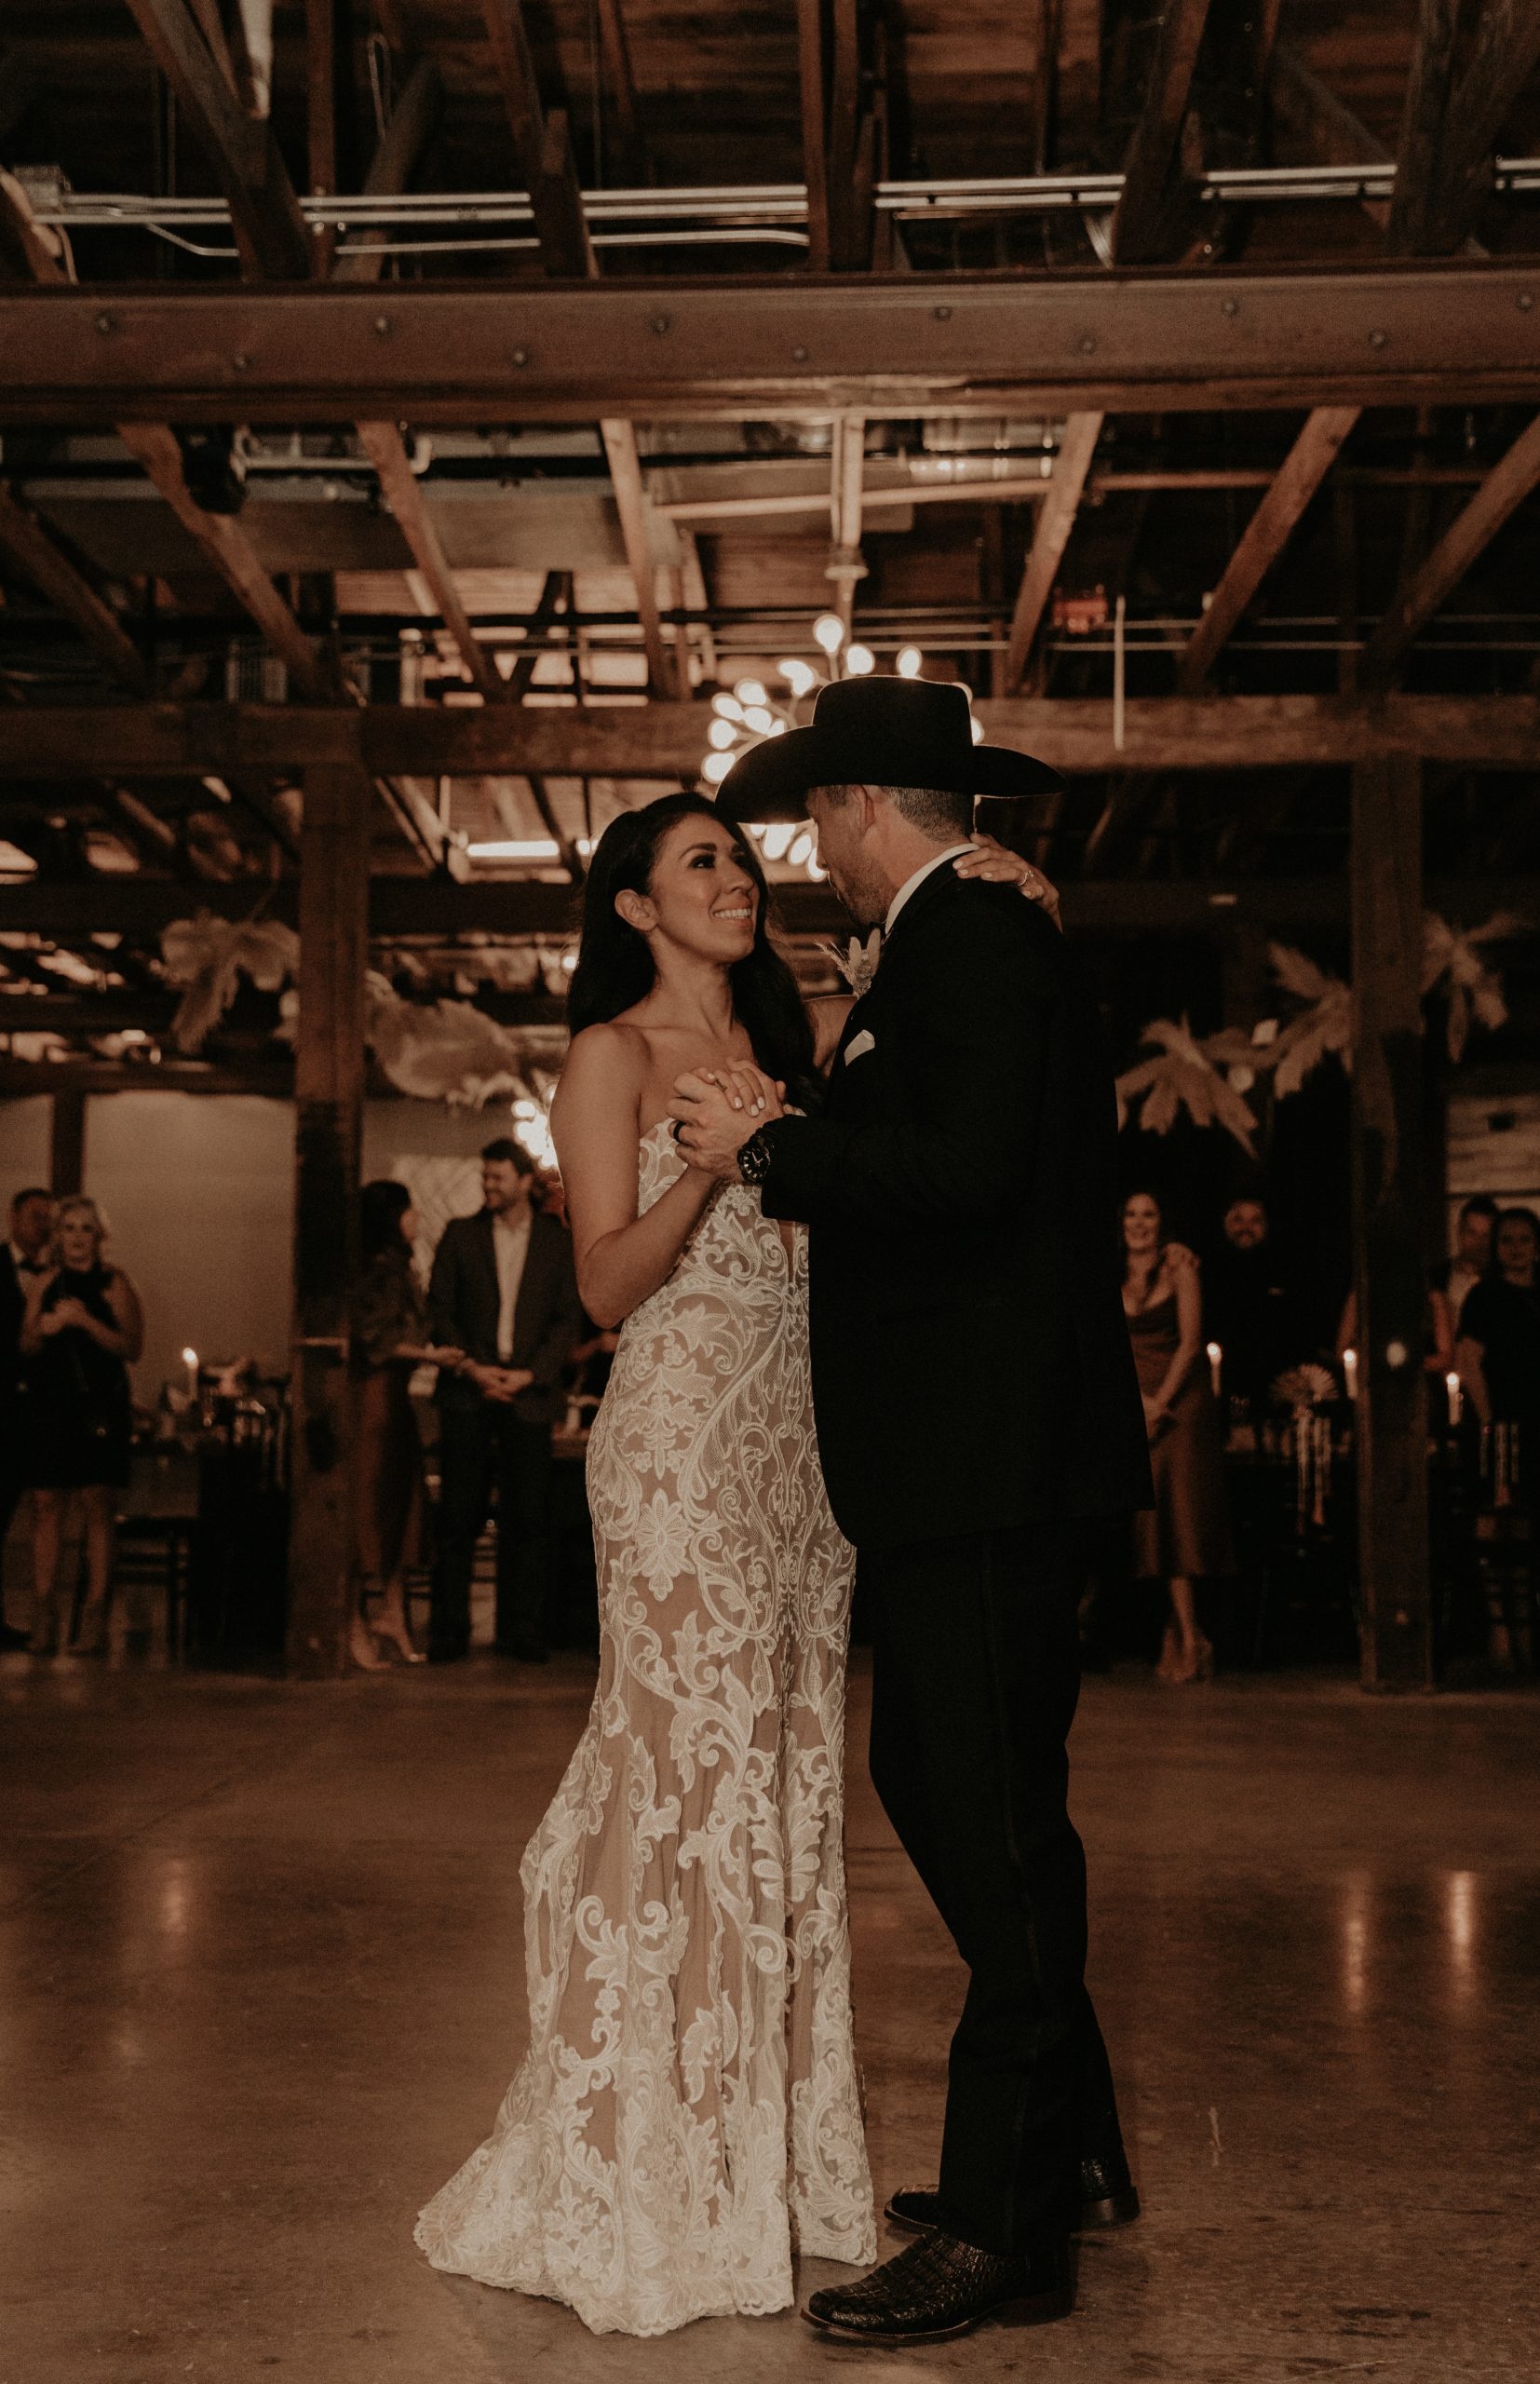 Mod West Wedding - First Dance